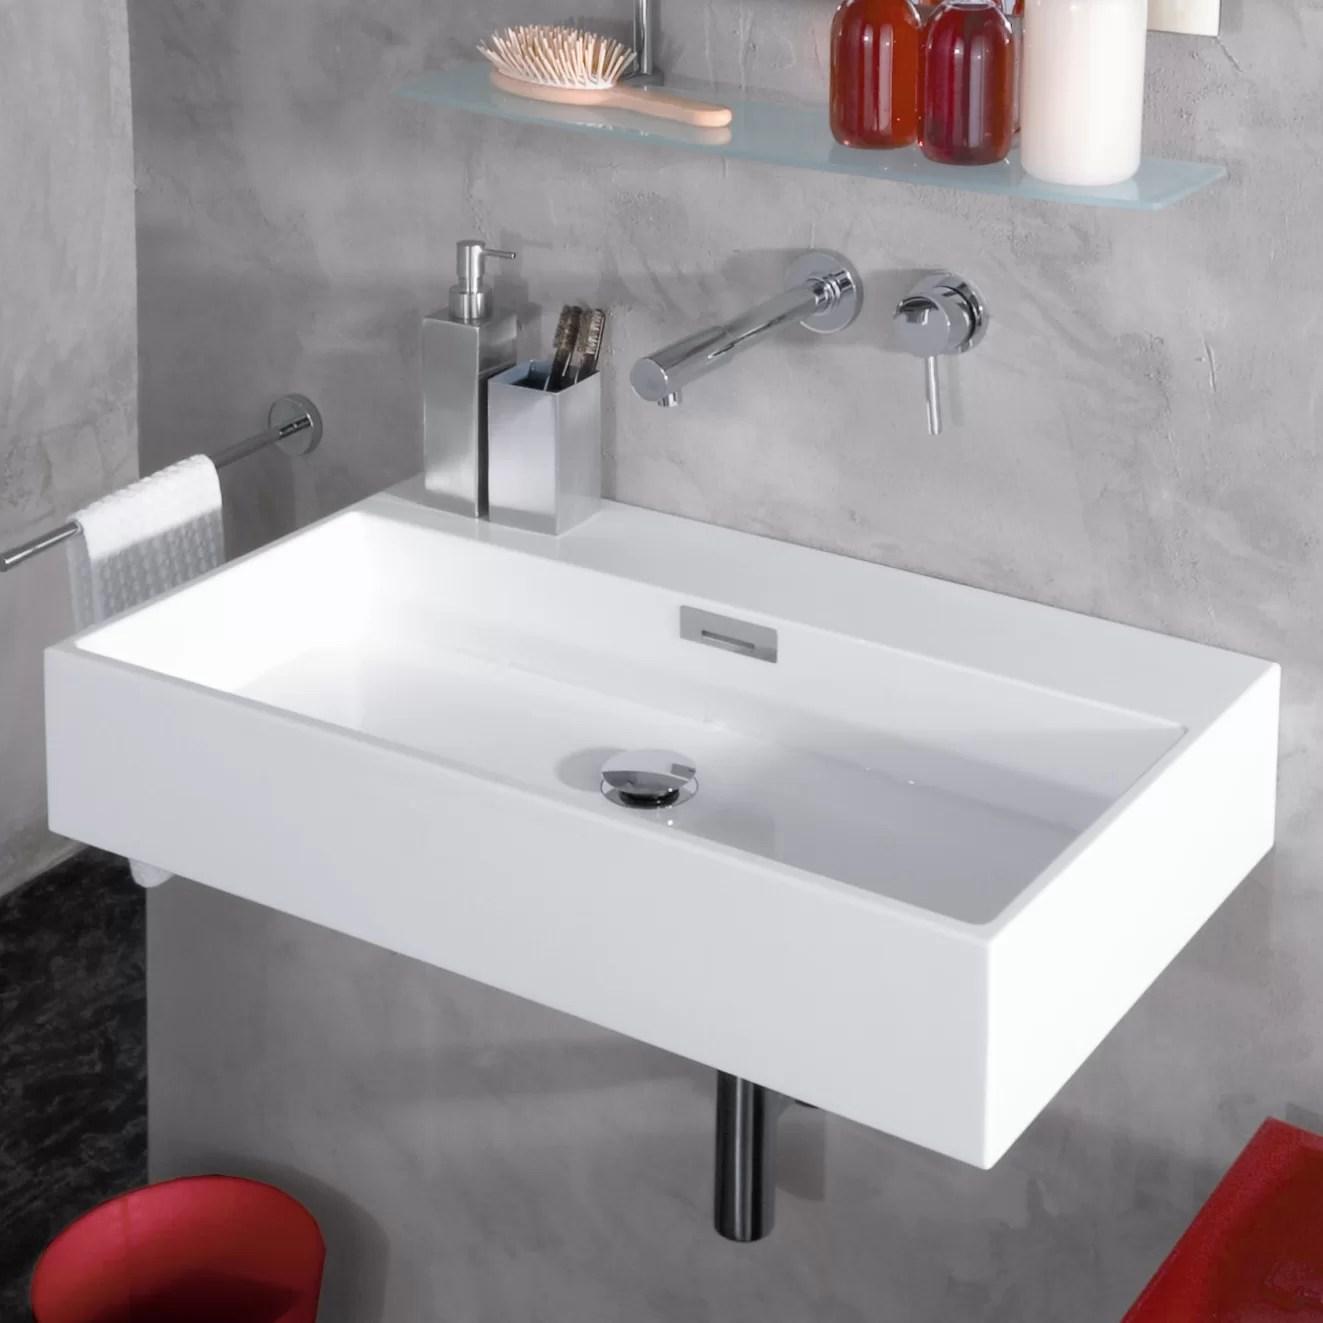 WS Bath Collections Modern Wall Mounted Vessel Bathroom Sink  Reviews  Wayfair